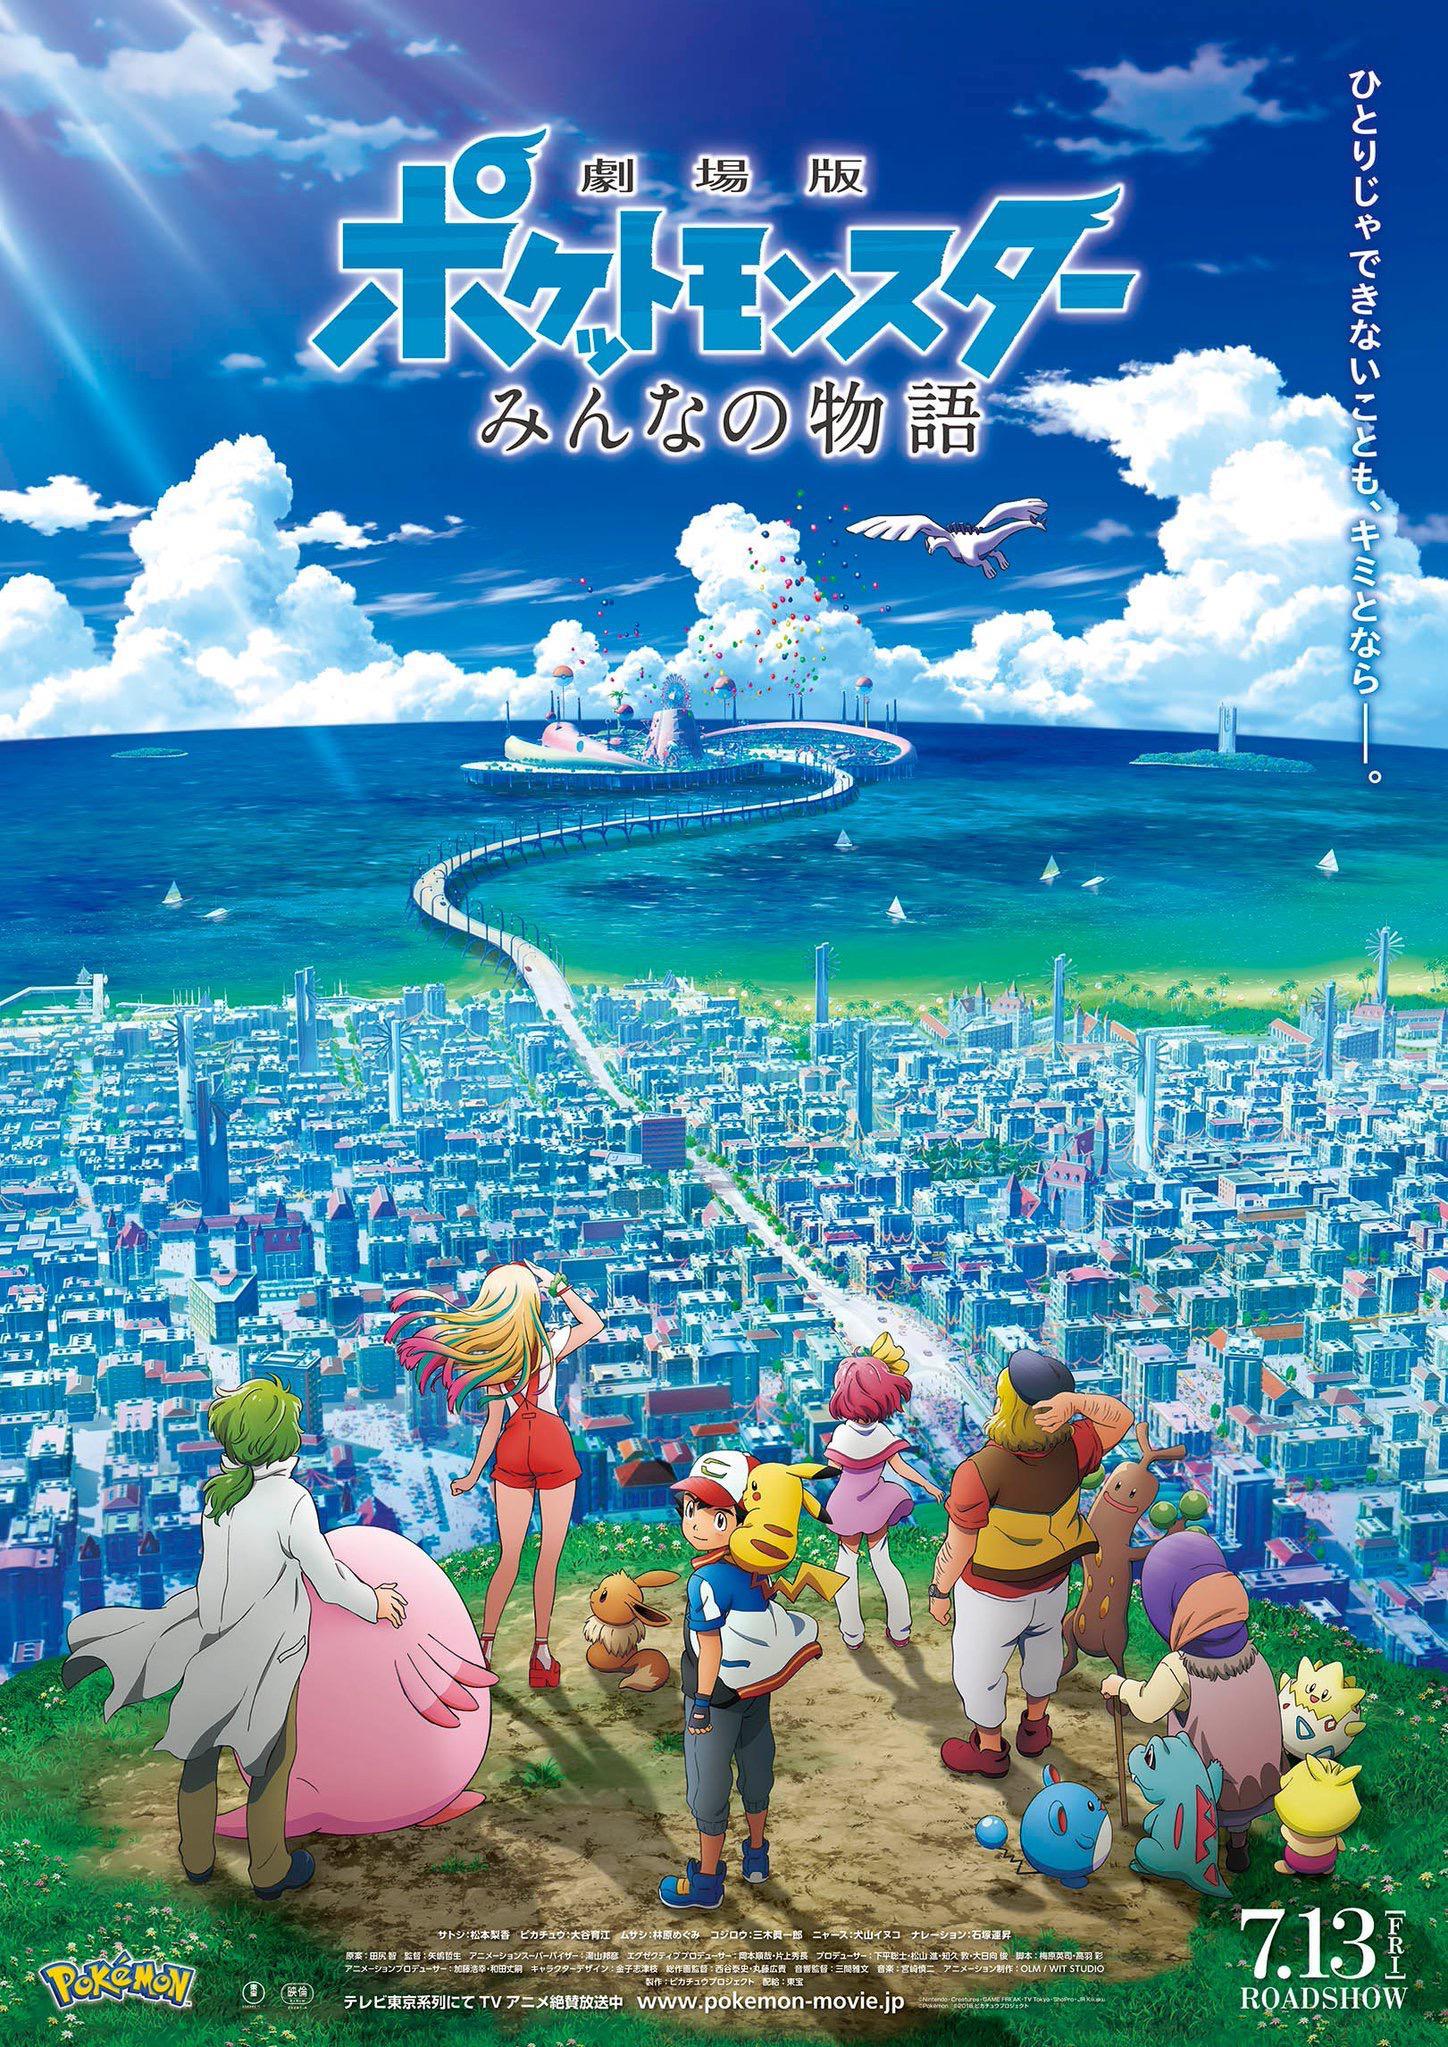 Pokemon movie 21 bluray-dvd shogakukan.jpg